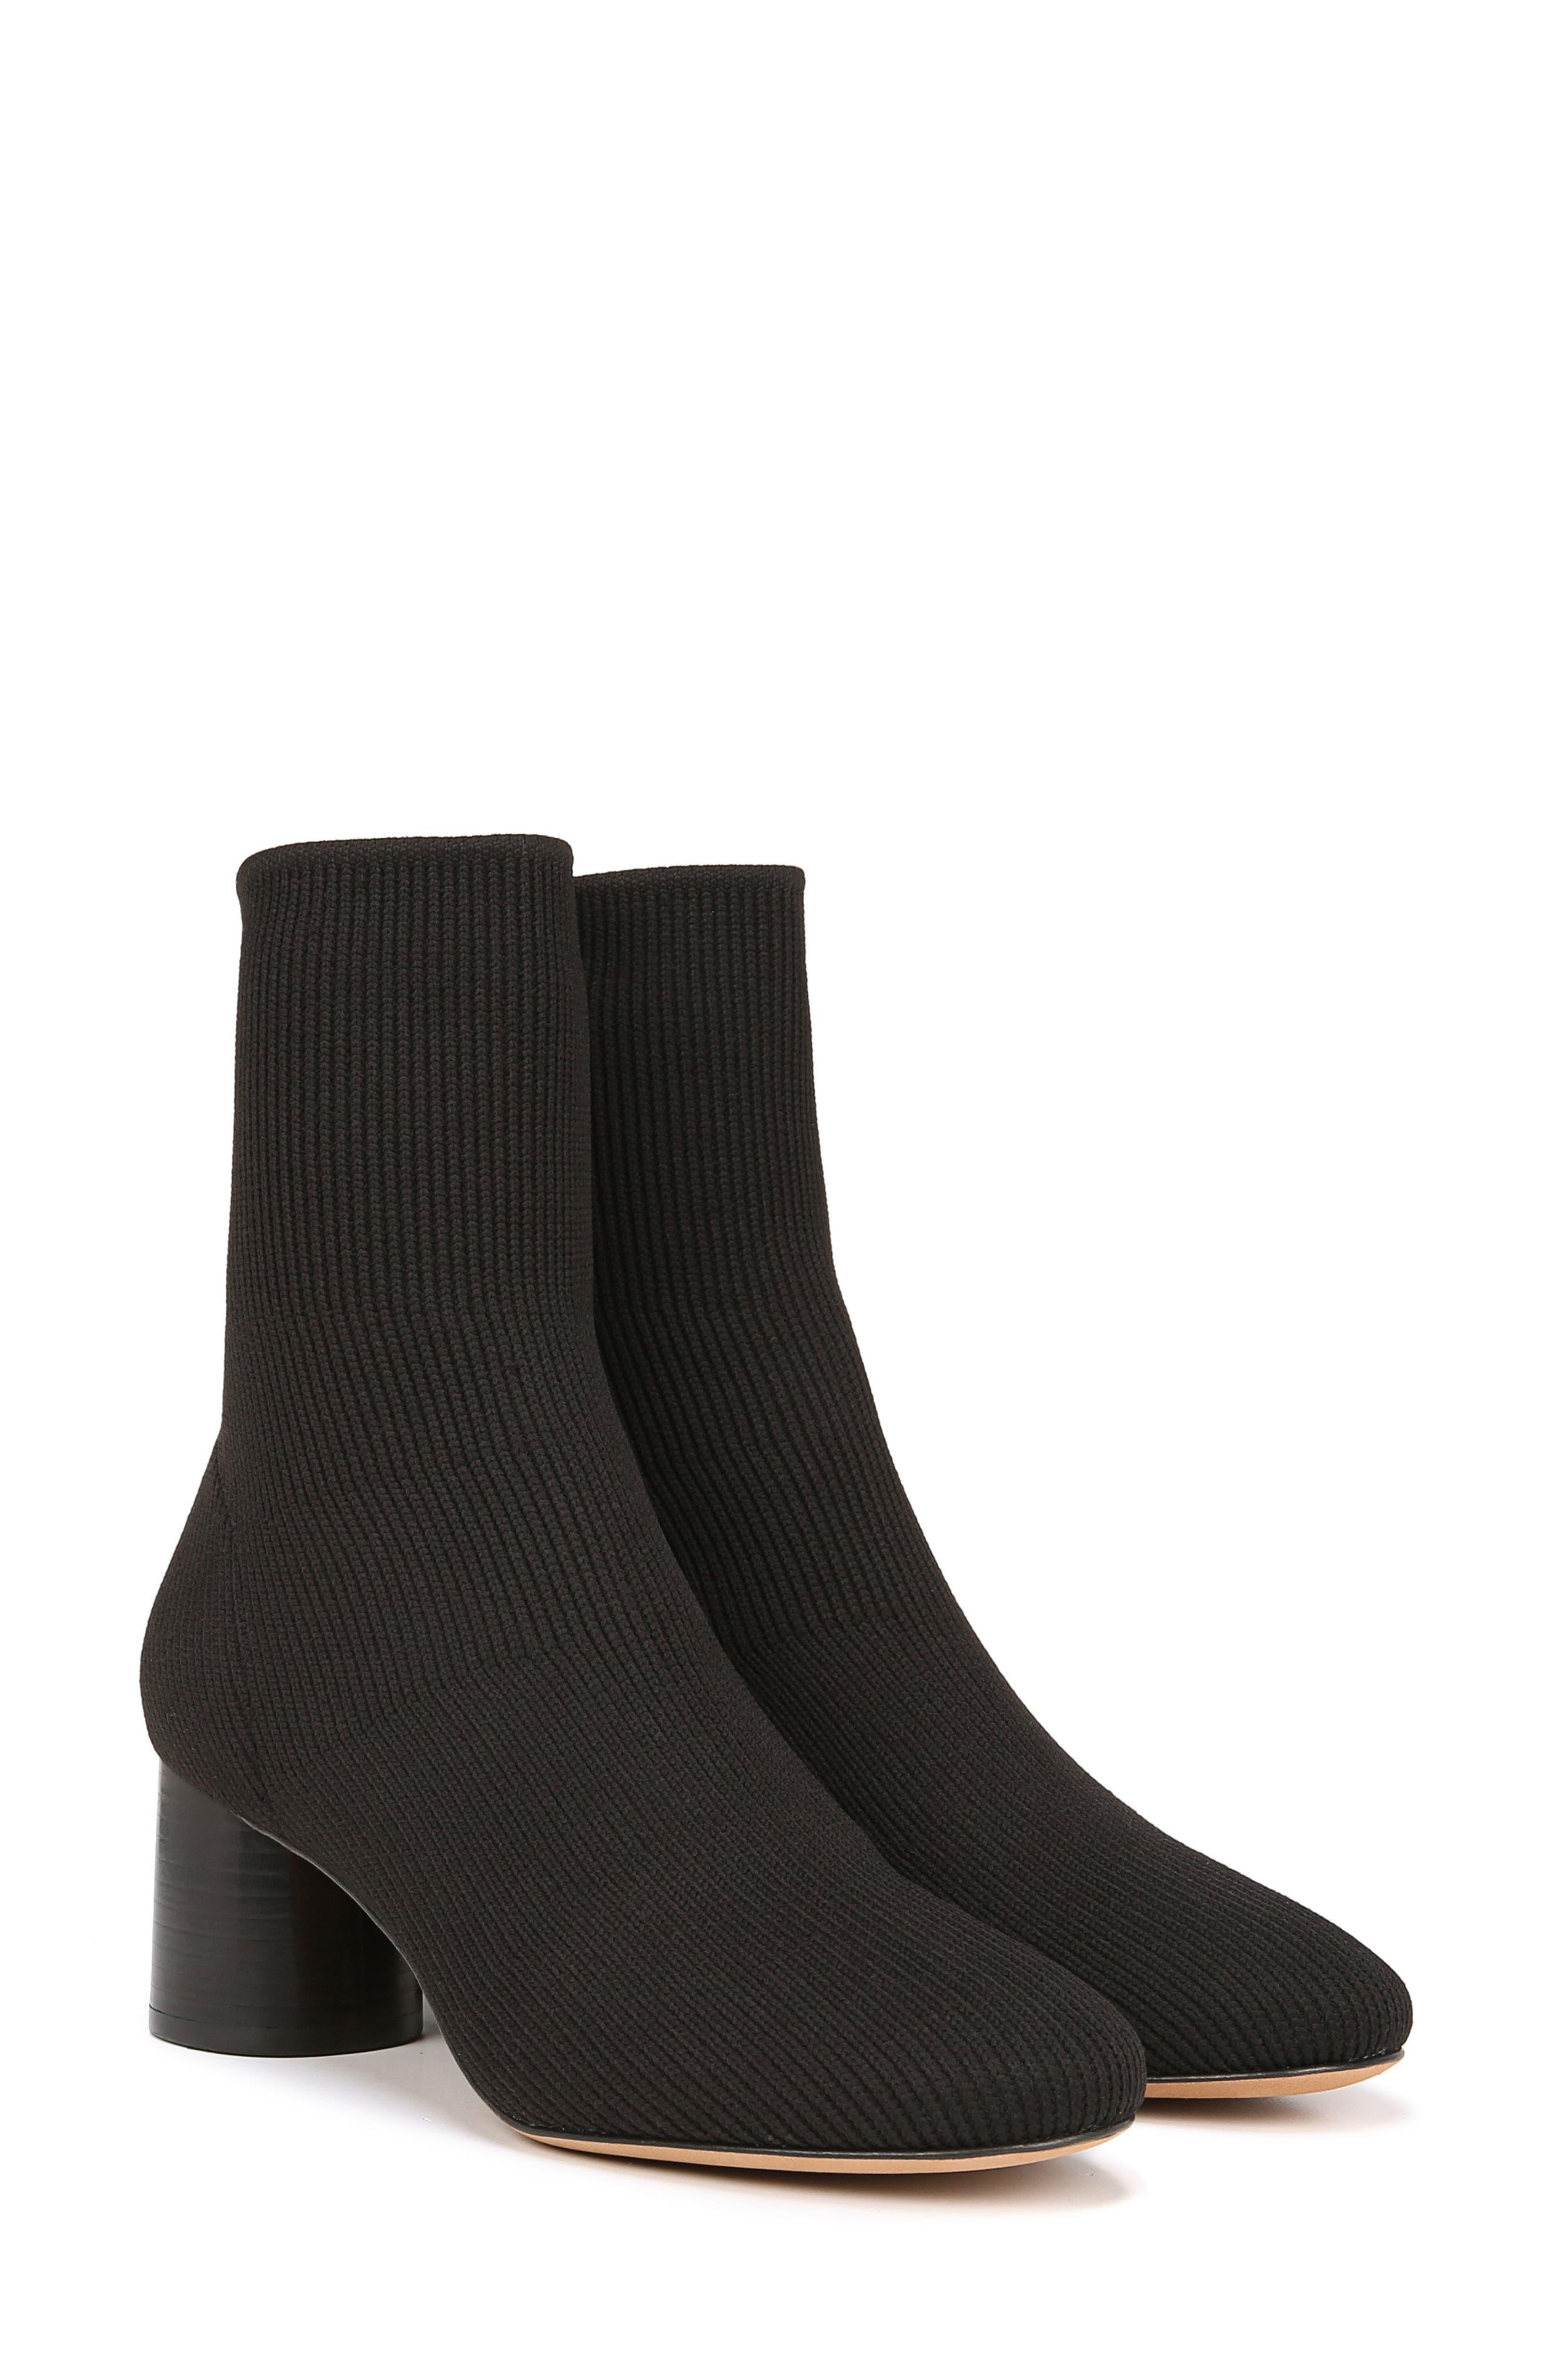 VINCE, Tasha Sock Bootie, Alternate thumbnail 8, color, BLACK